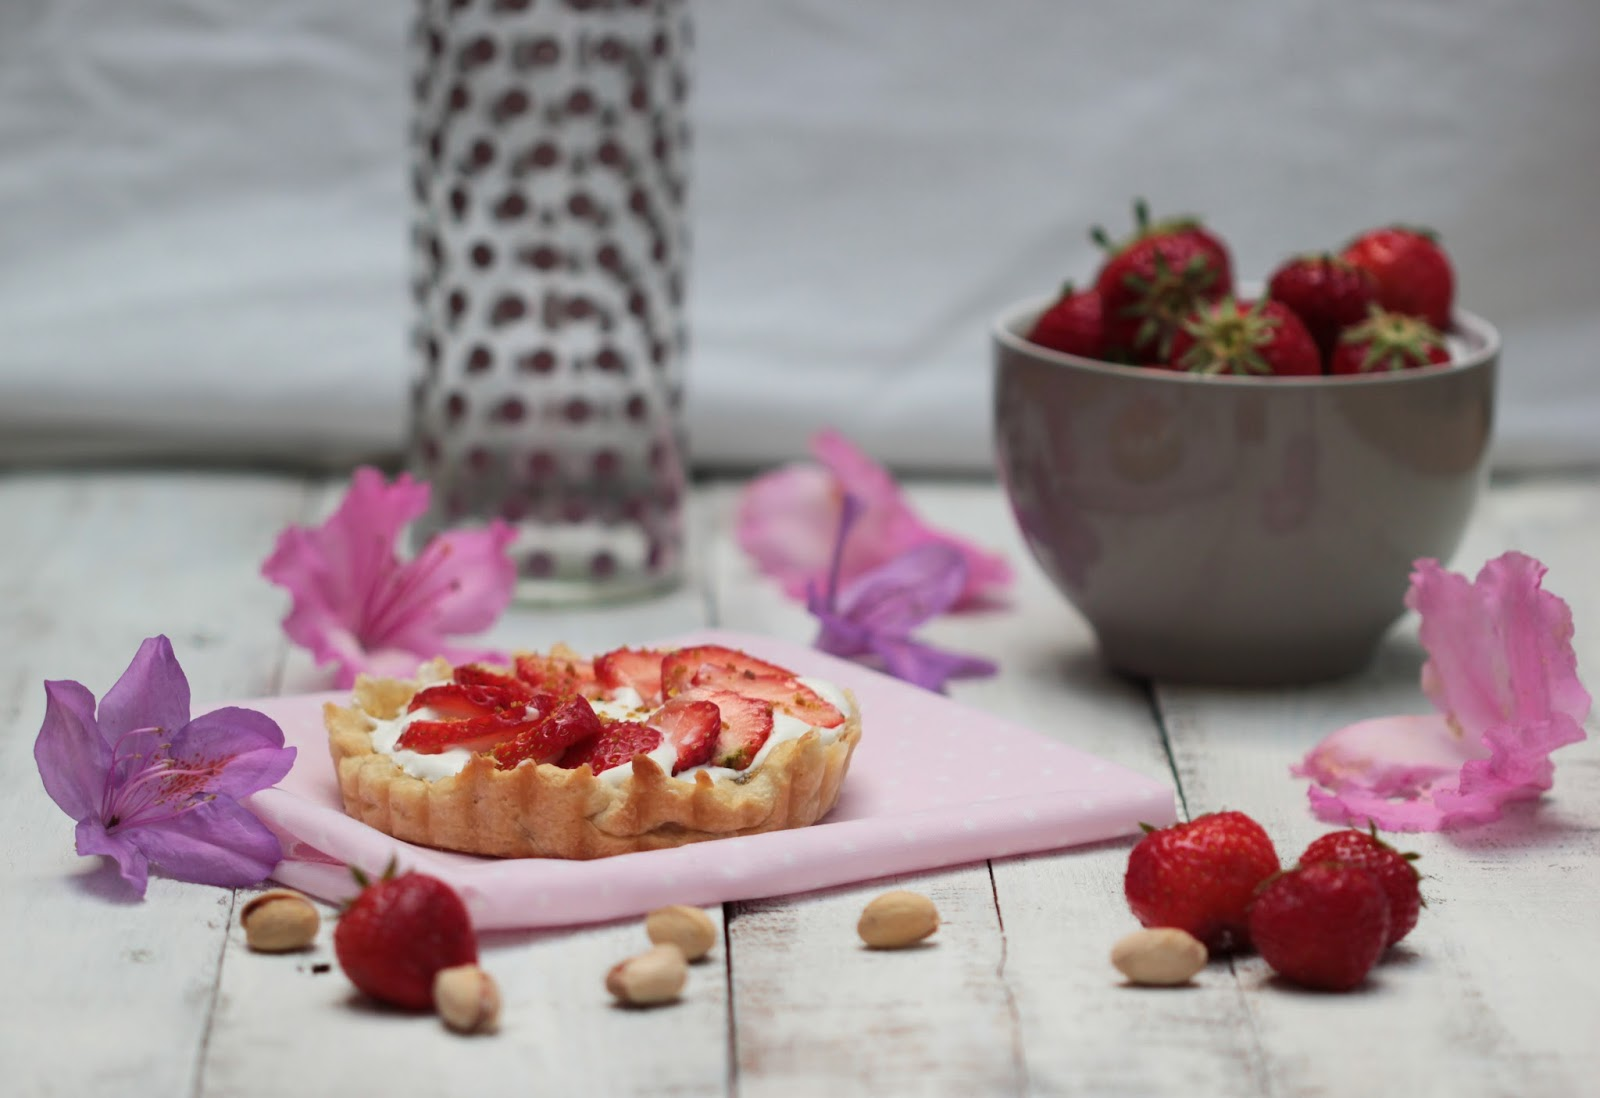 http://carnet-sucre.blogspot.com/2015/11/tartelette-fraise-pistache.html